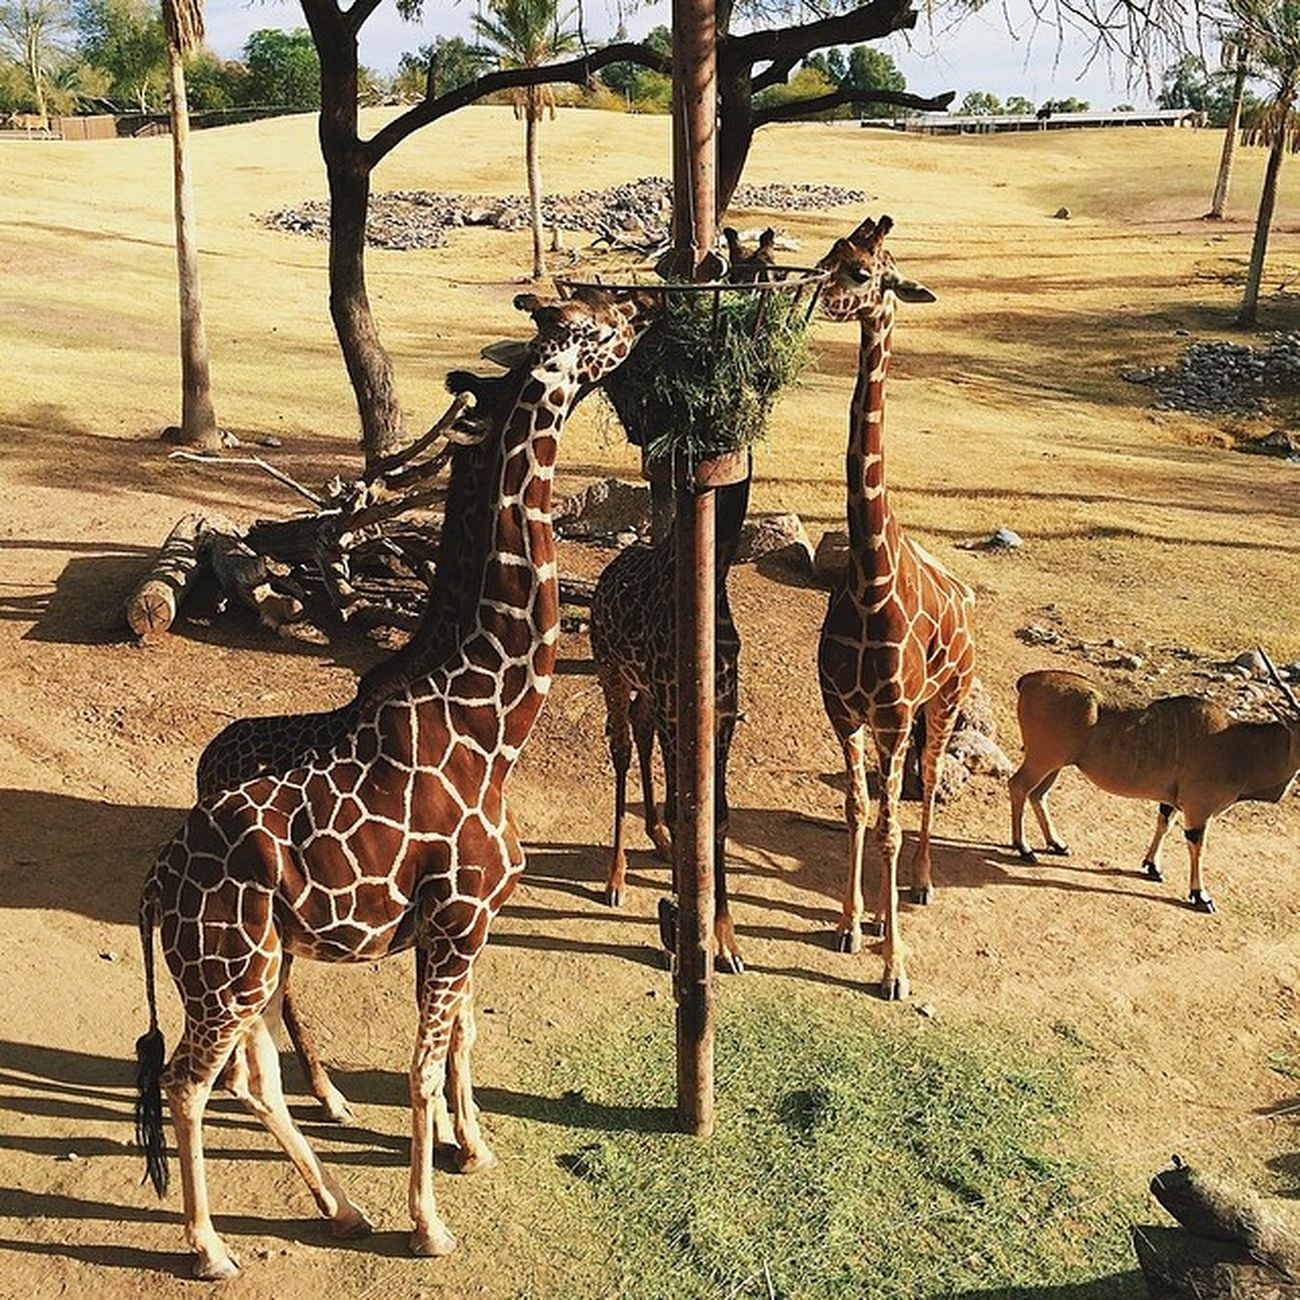 Nature Beautiful Pretty Beauty iphonesia vsco vscocam vscoexpo vscounited instagramaz arizona landscape igersphx instagood vscophile igersusa phoenix phxzoo zoo giraffe wildlife animal